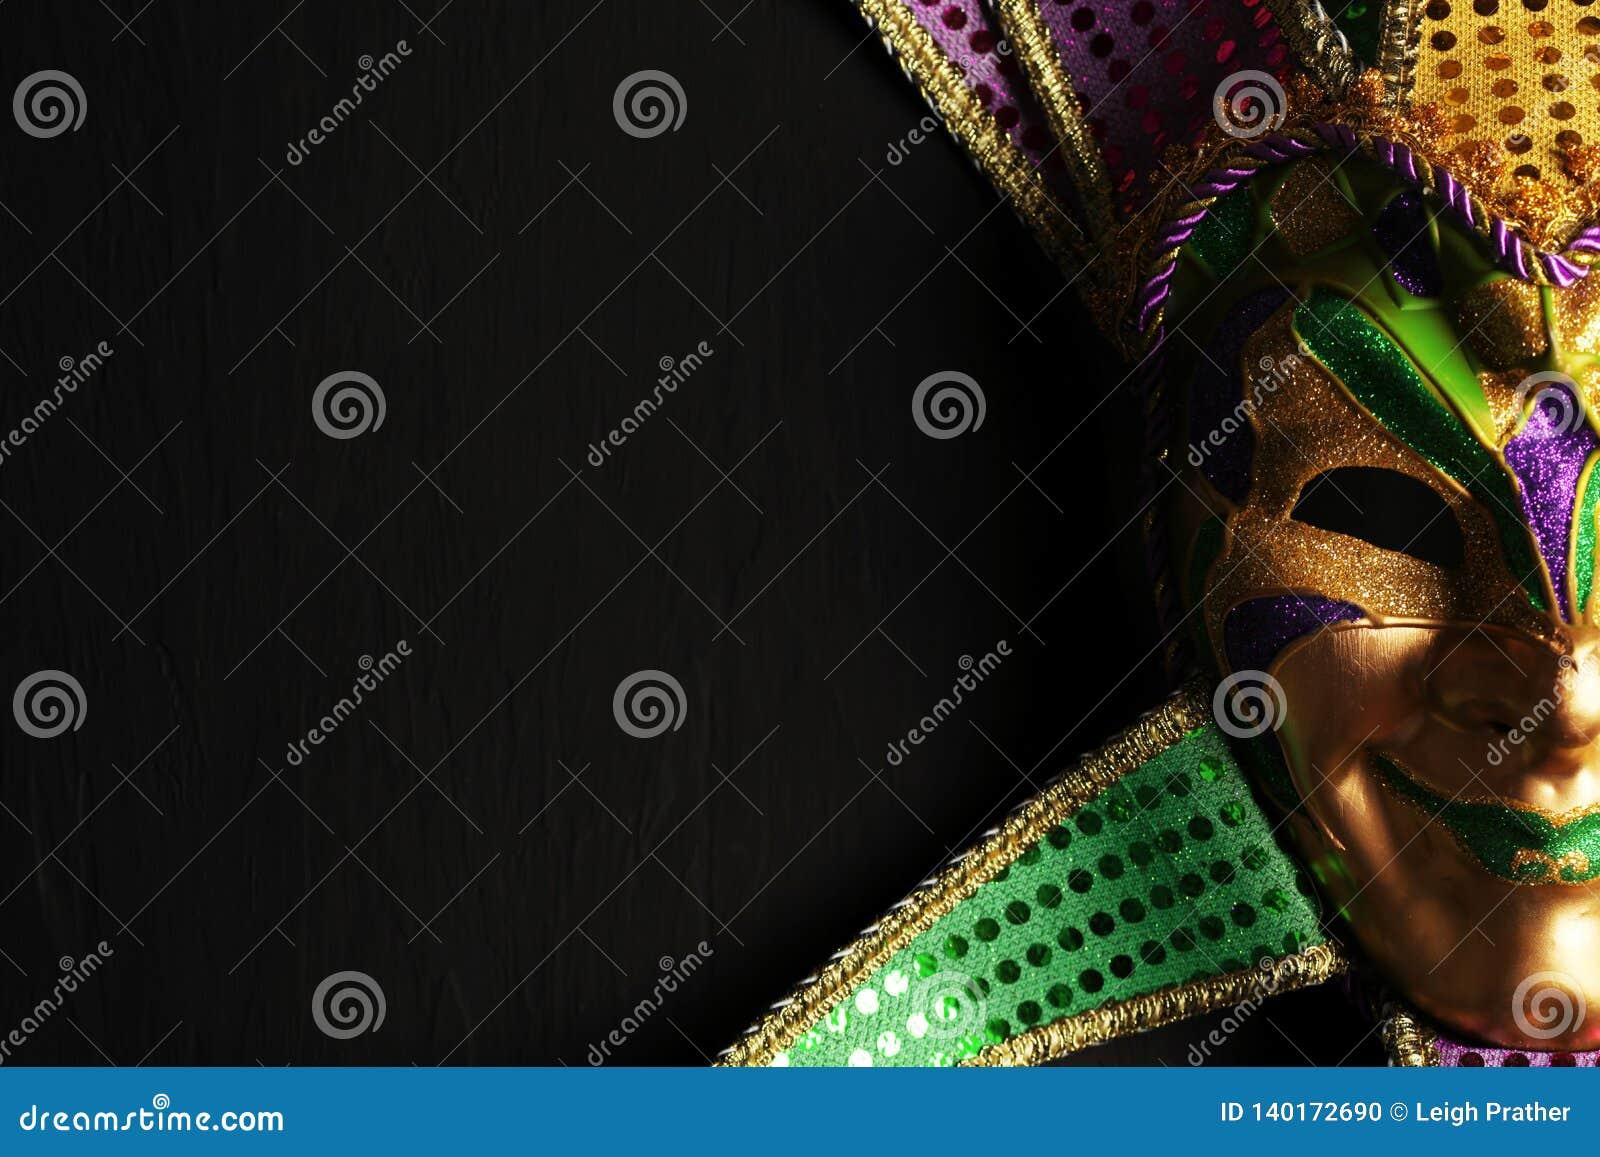 Colorful Mardi Gras mask background